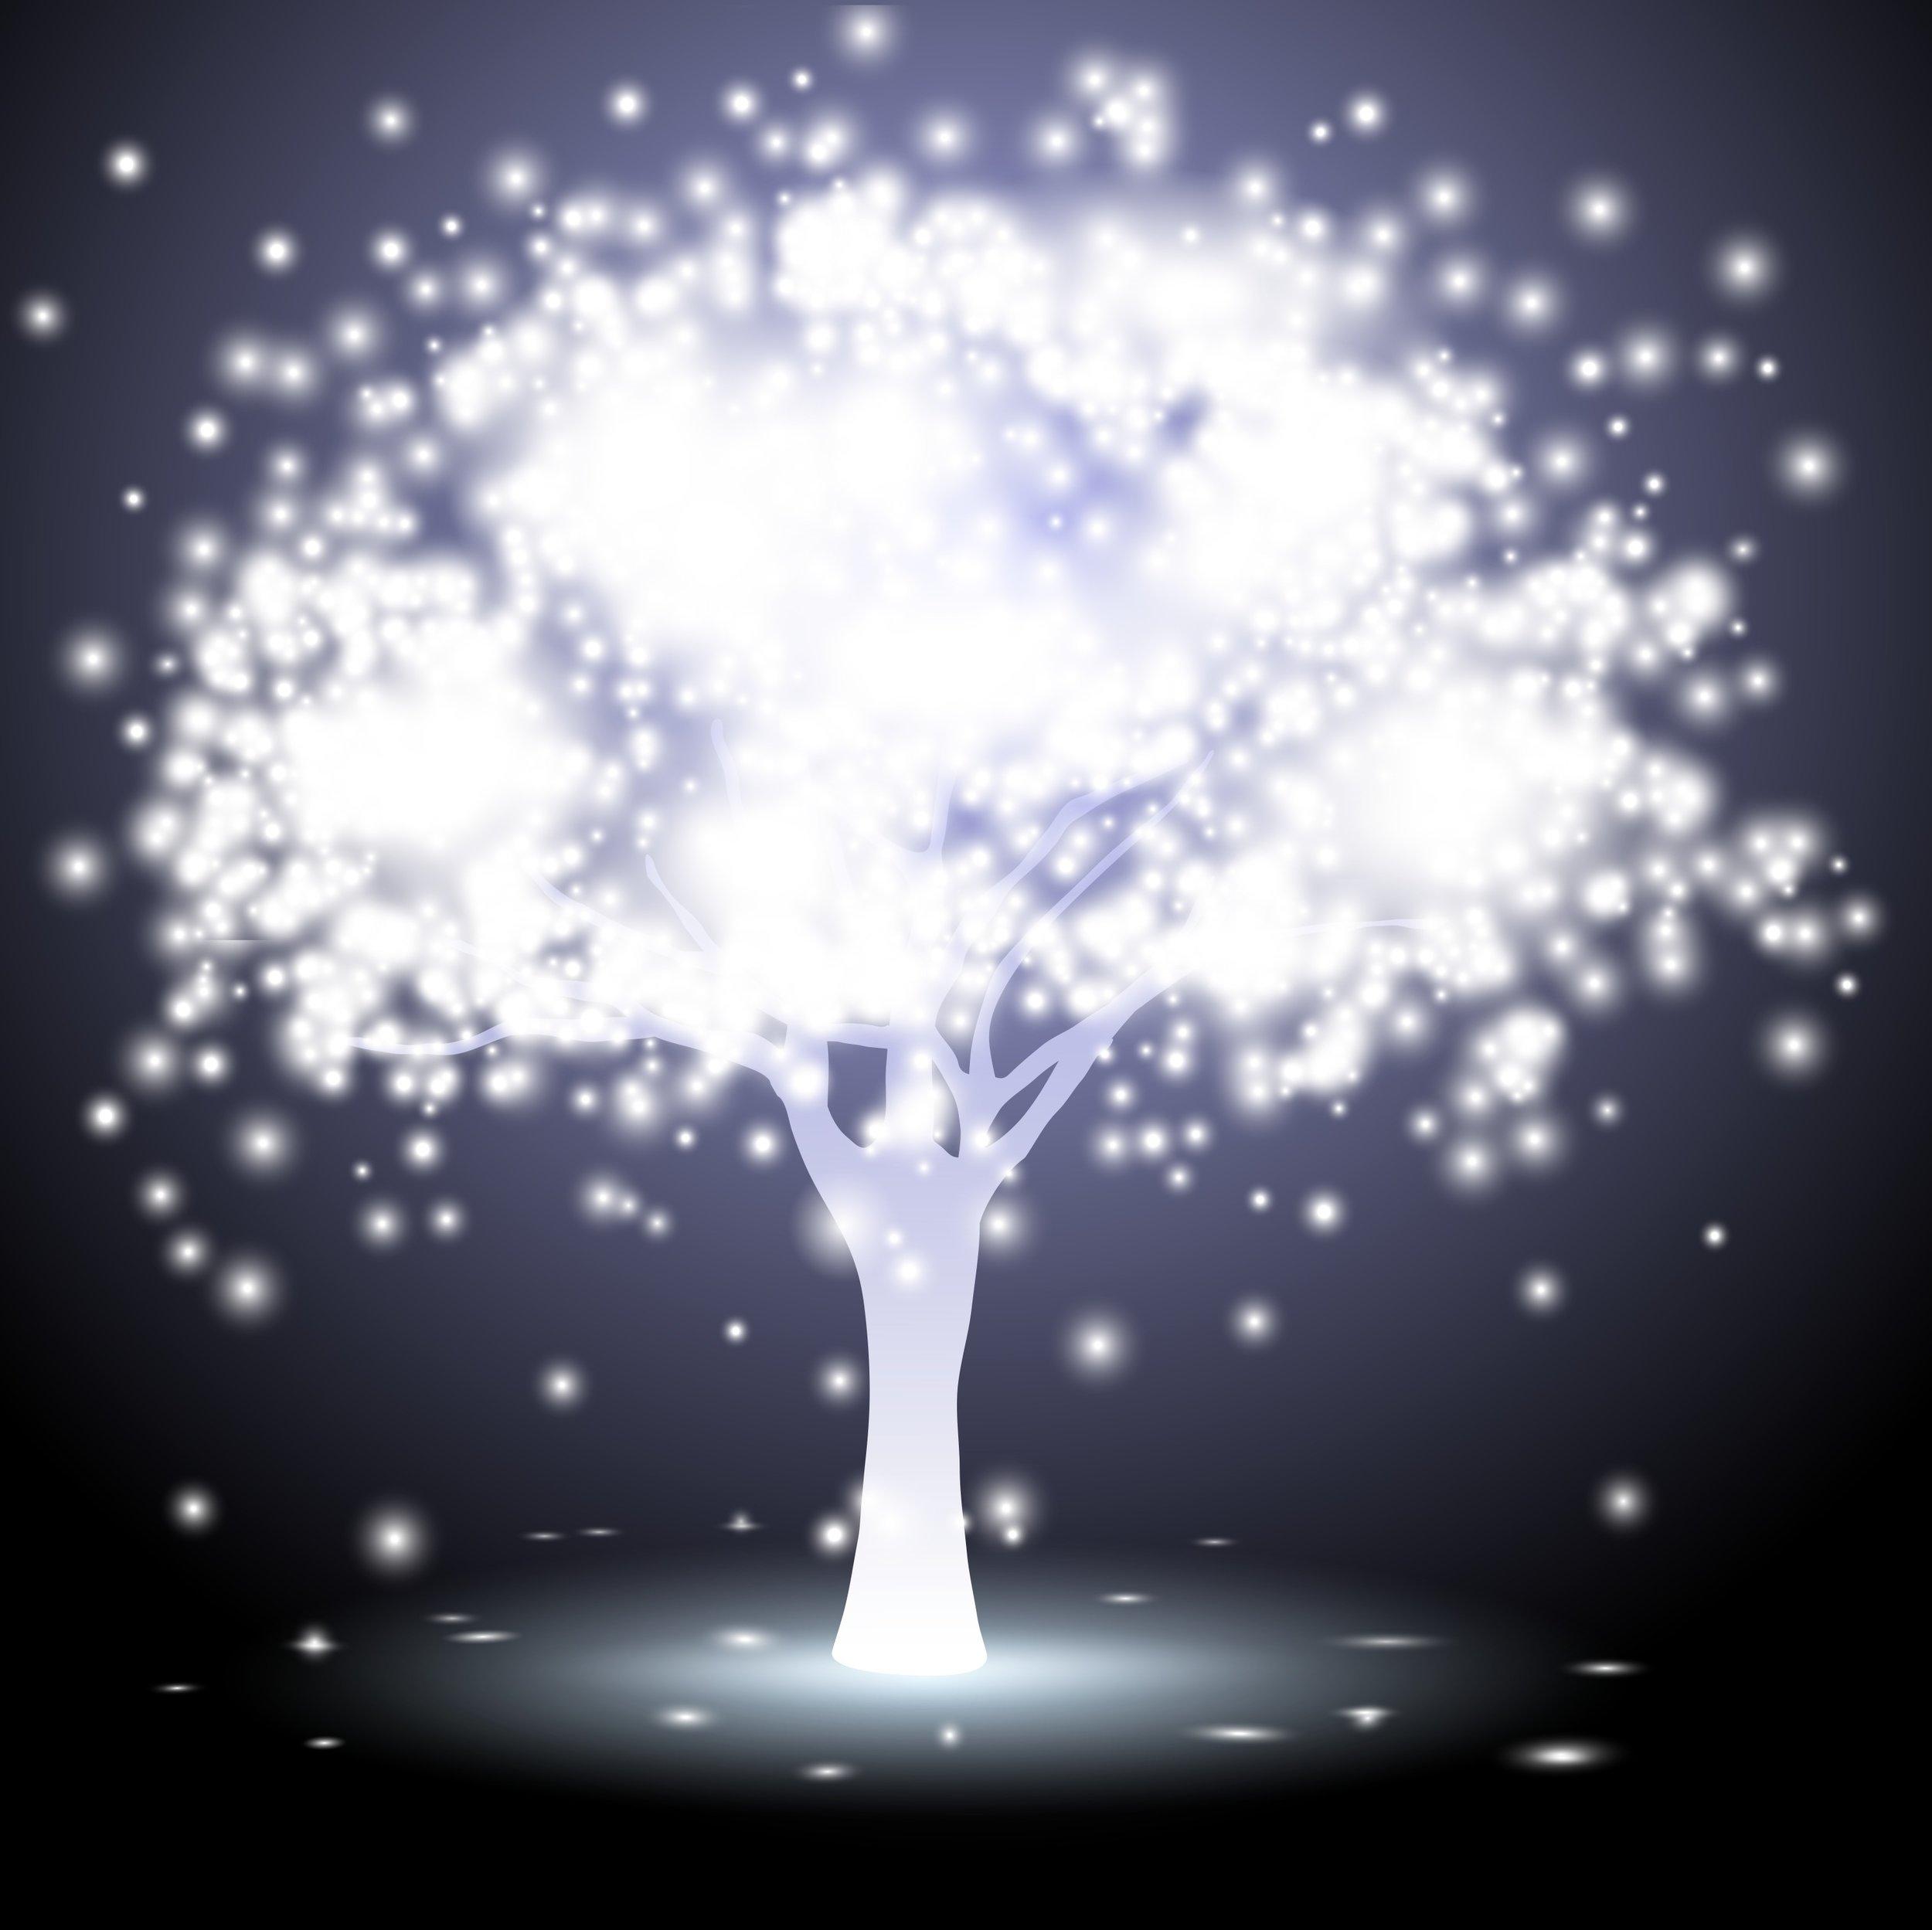 tree-made-of-lights_GyXaTCL_.jpg